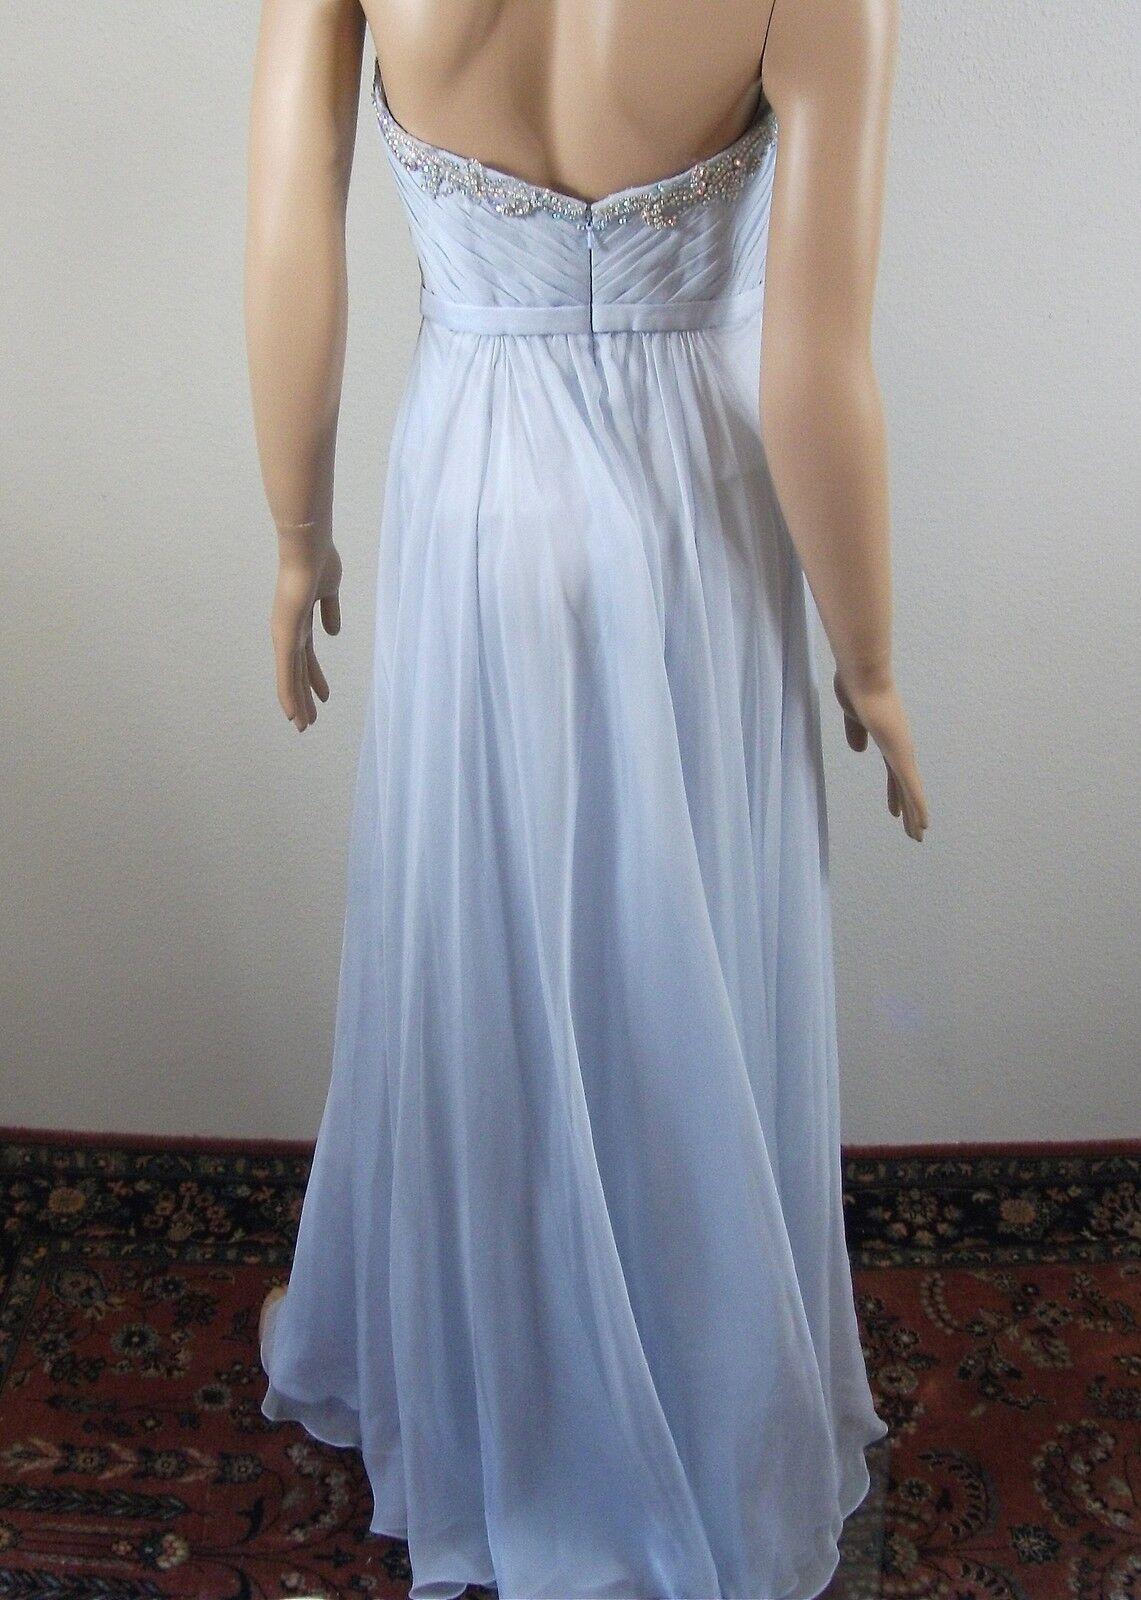 La La La Femme Crystal Embellished Gown Dress Size 4 b15b91